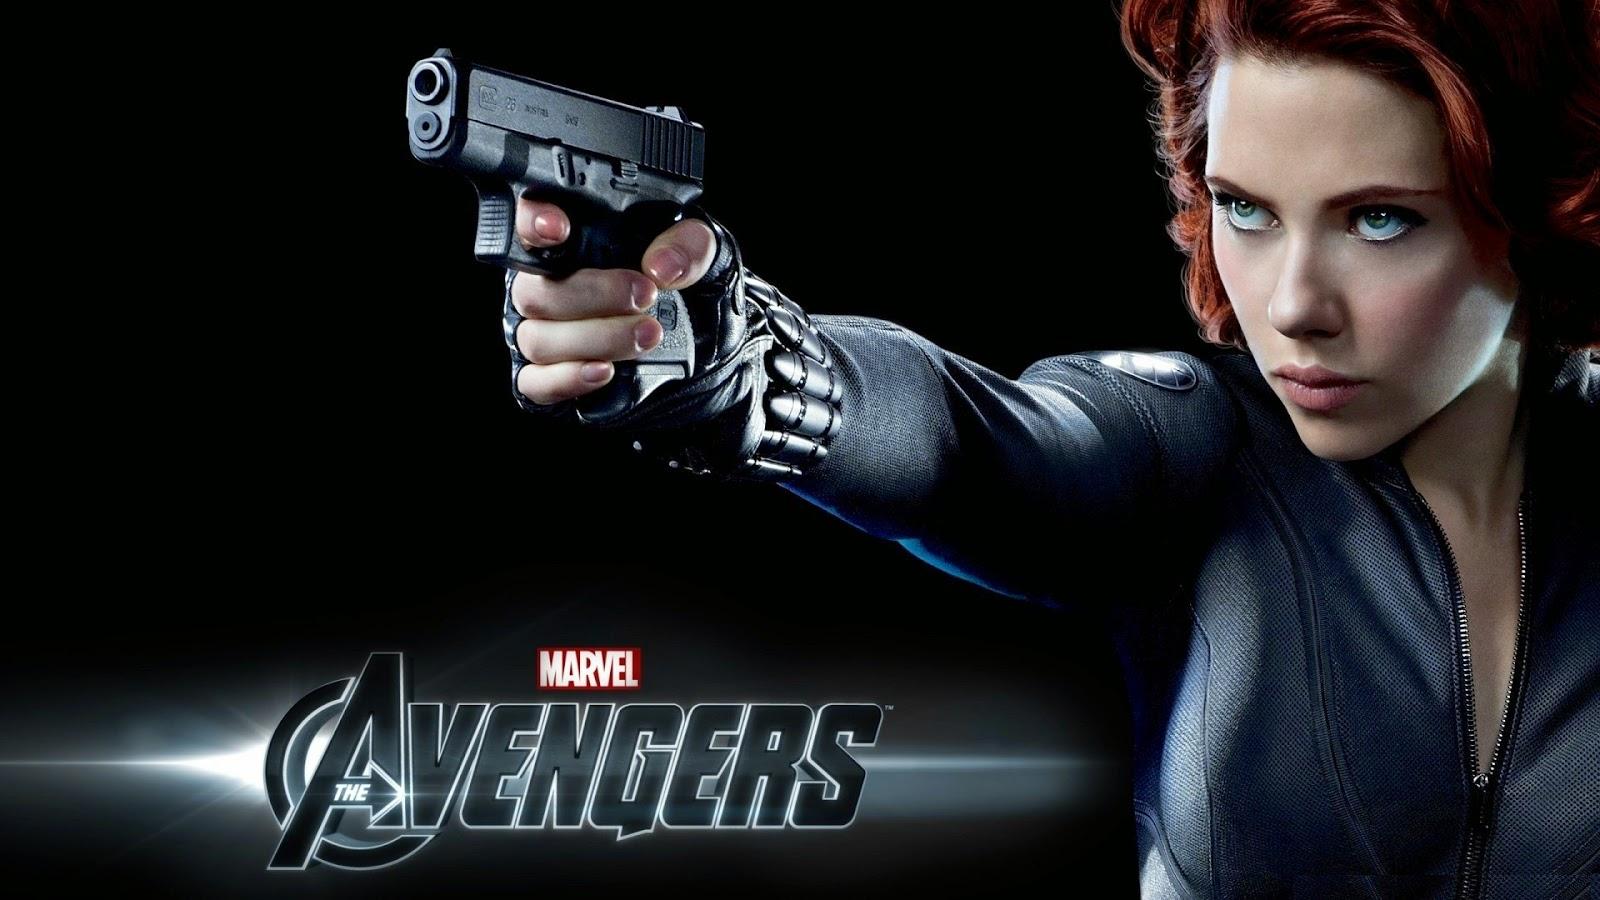 Papel de Parede Filme Os Vingadores Era de Ultron Viuva Negra